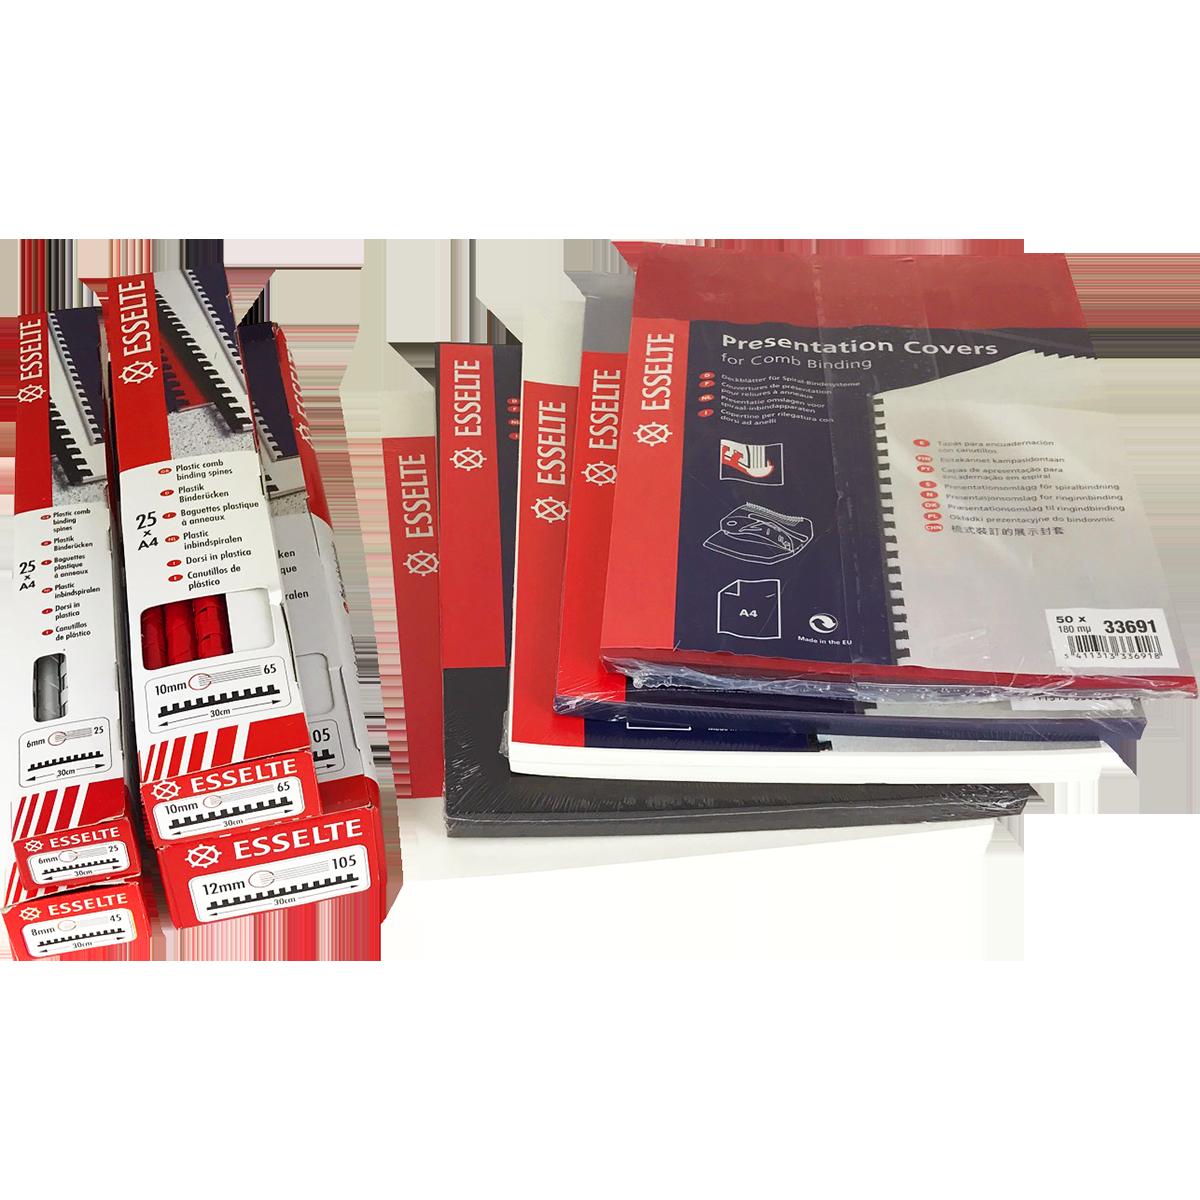 GBC / Ibico Kombo C250Pro Manual Plastic Comb Binding